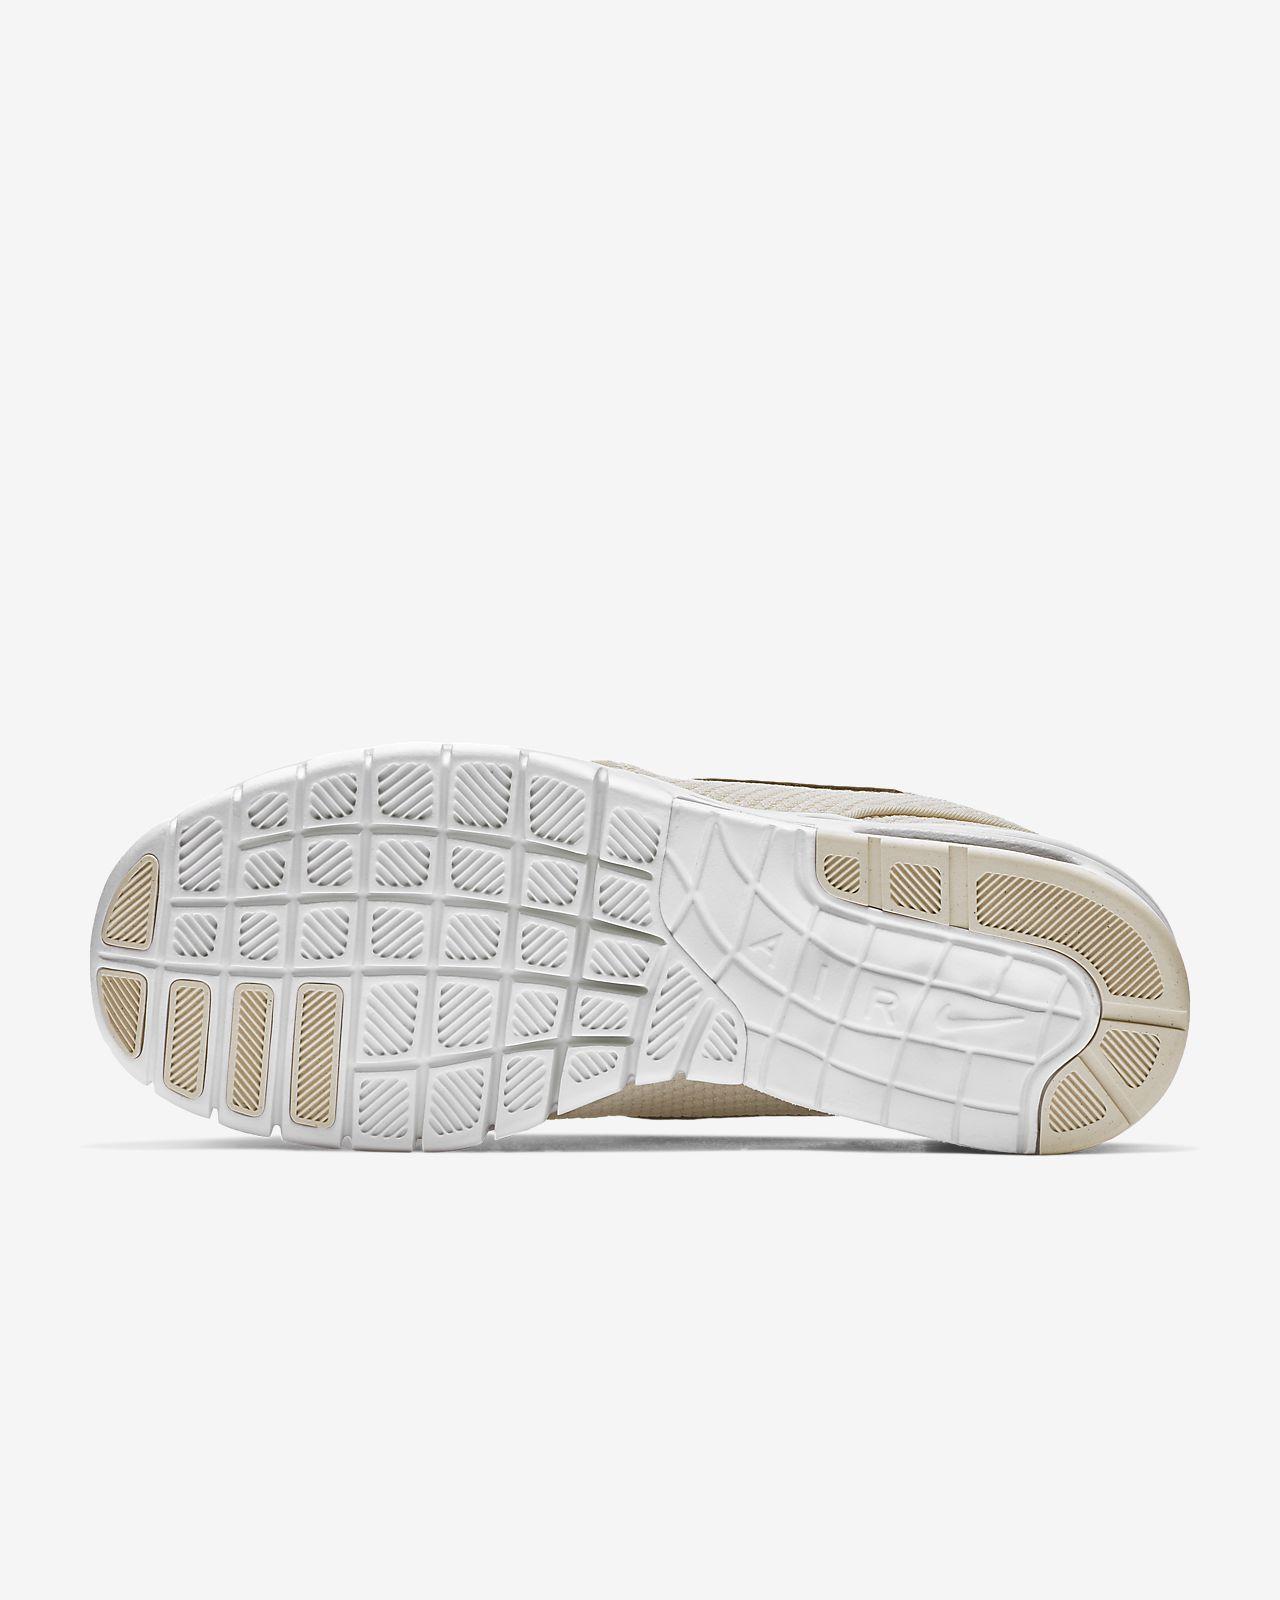 info for 096c8 ecc9d ... Nike SB Stefan Janoski Max Skate Shoe